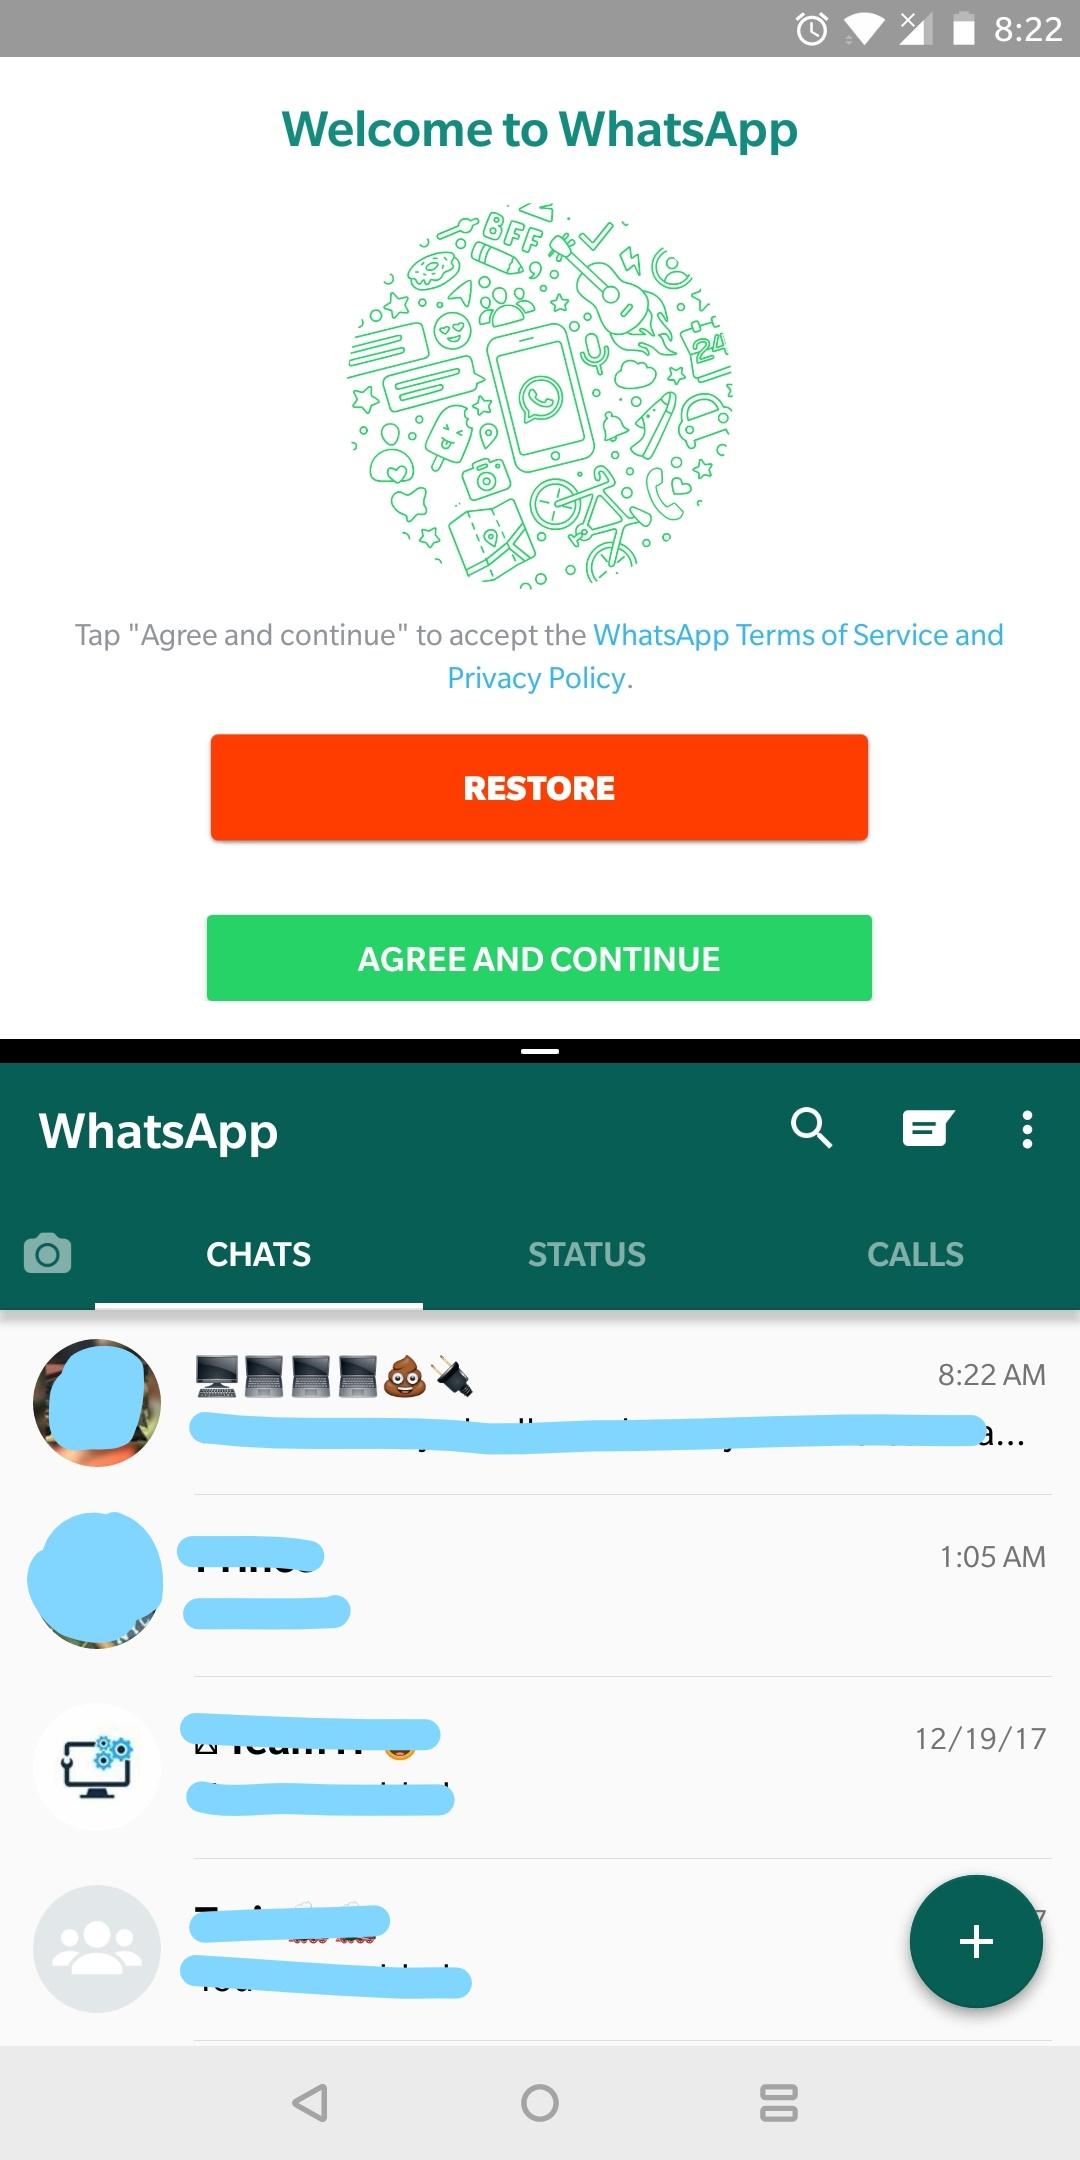 GBWhatsApp (APK): Run 2 WhatsApp Accounts on Android